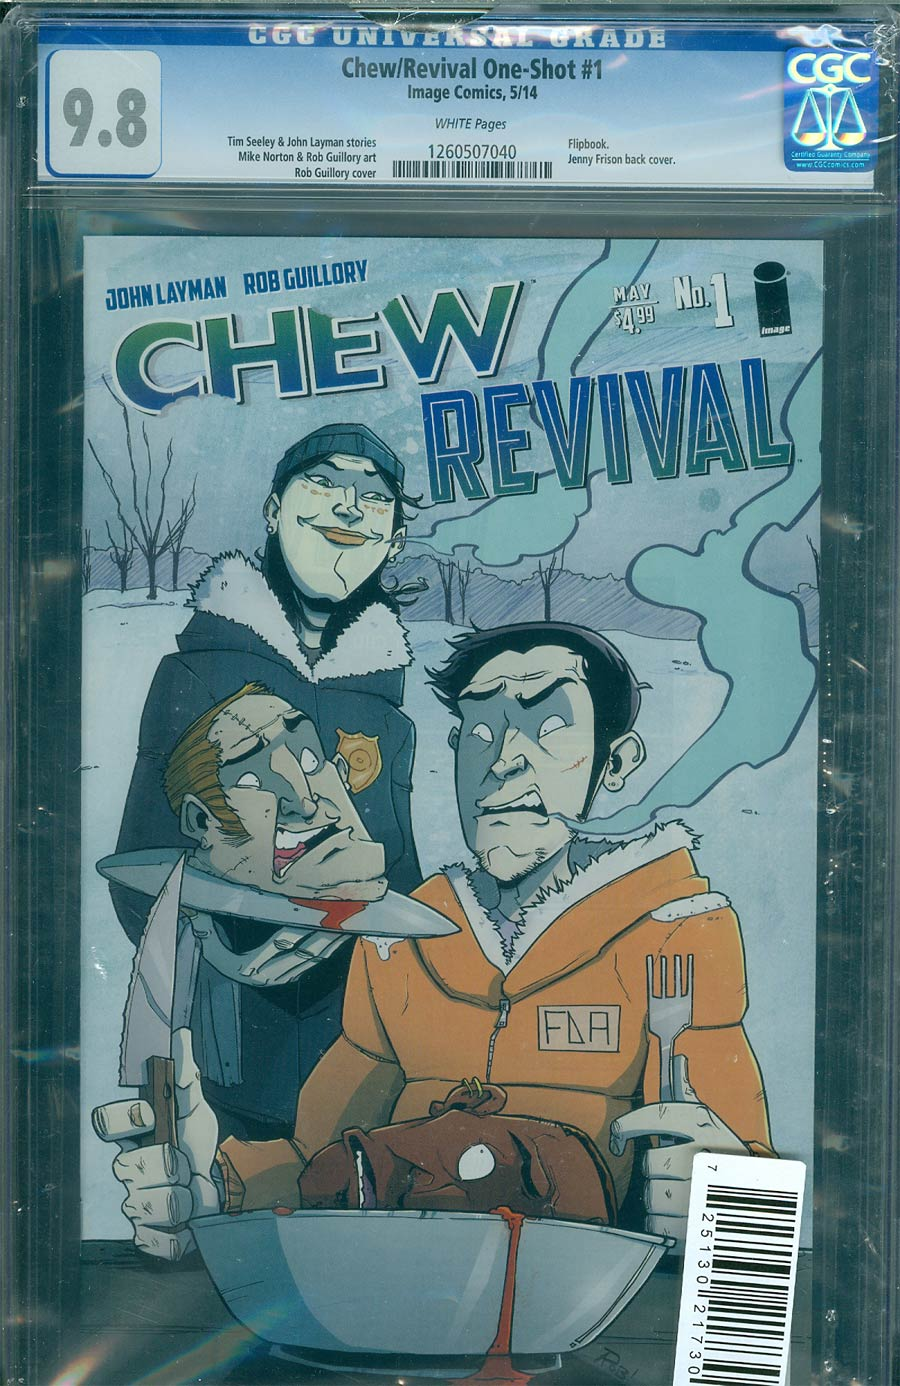 Chew / Revival #1 Cover C DF CGC 9.8